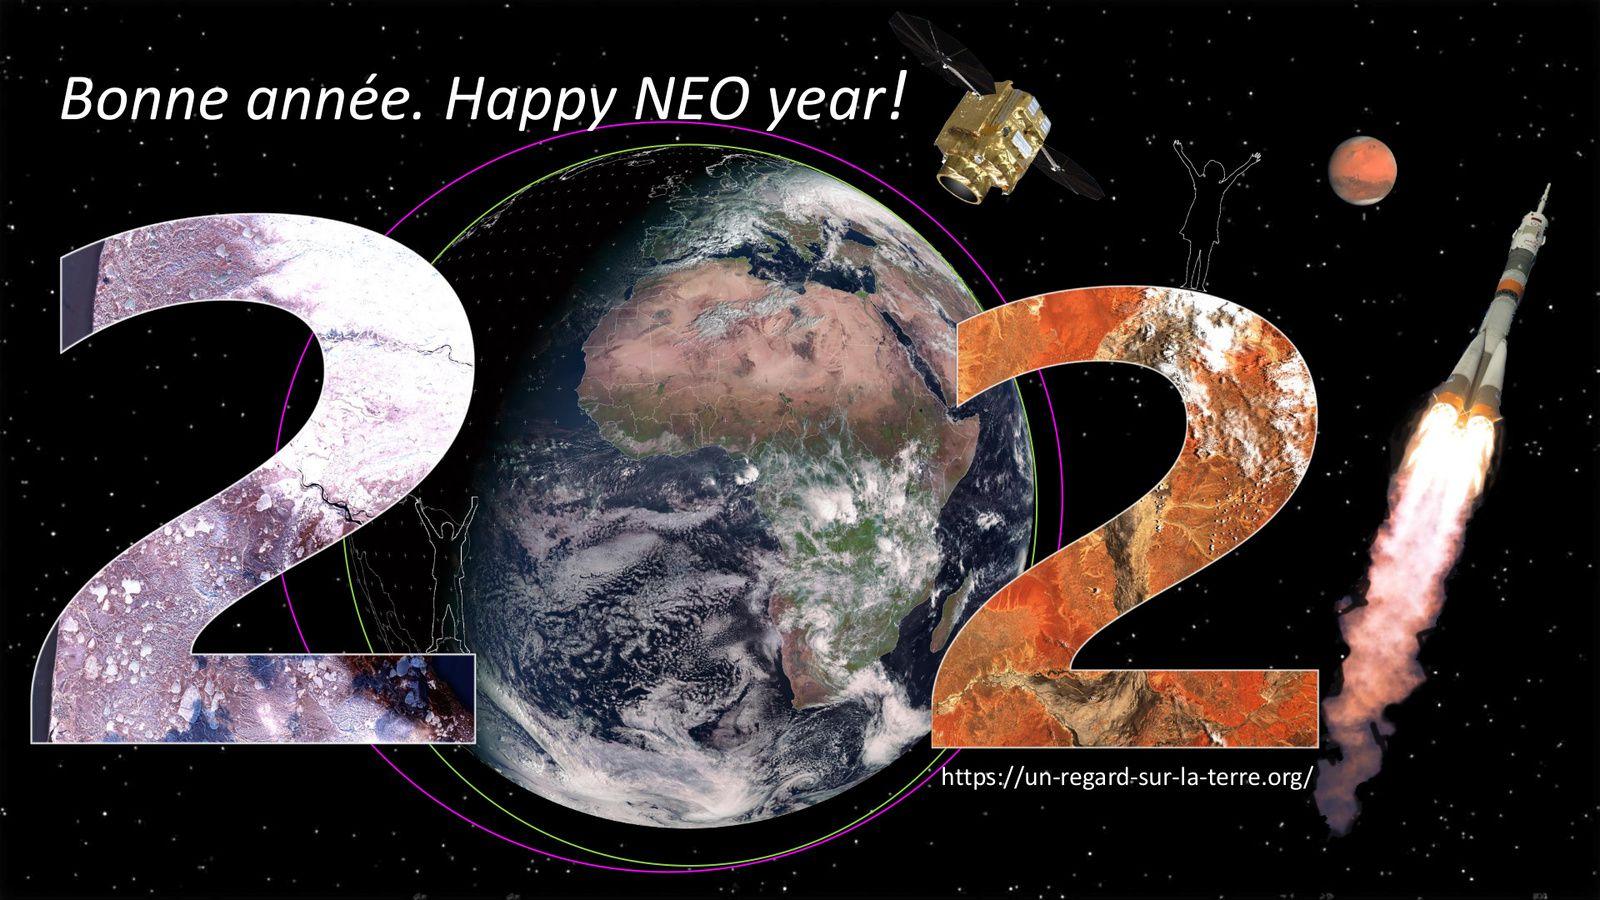 Nouvel an - Année 2021 - Voeux - Best wishes - Season's greetings - Happy new year - Sentinel-2 - Meteosat - Pleiades NEO - Soyouz - Eumetsat - Copernicus - Mars - Hope - Perseverance